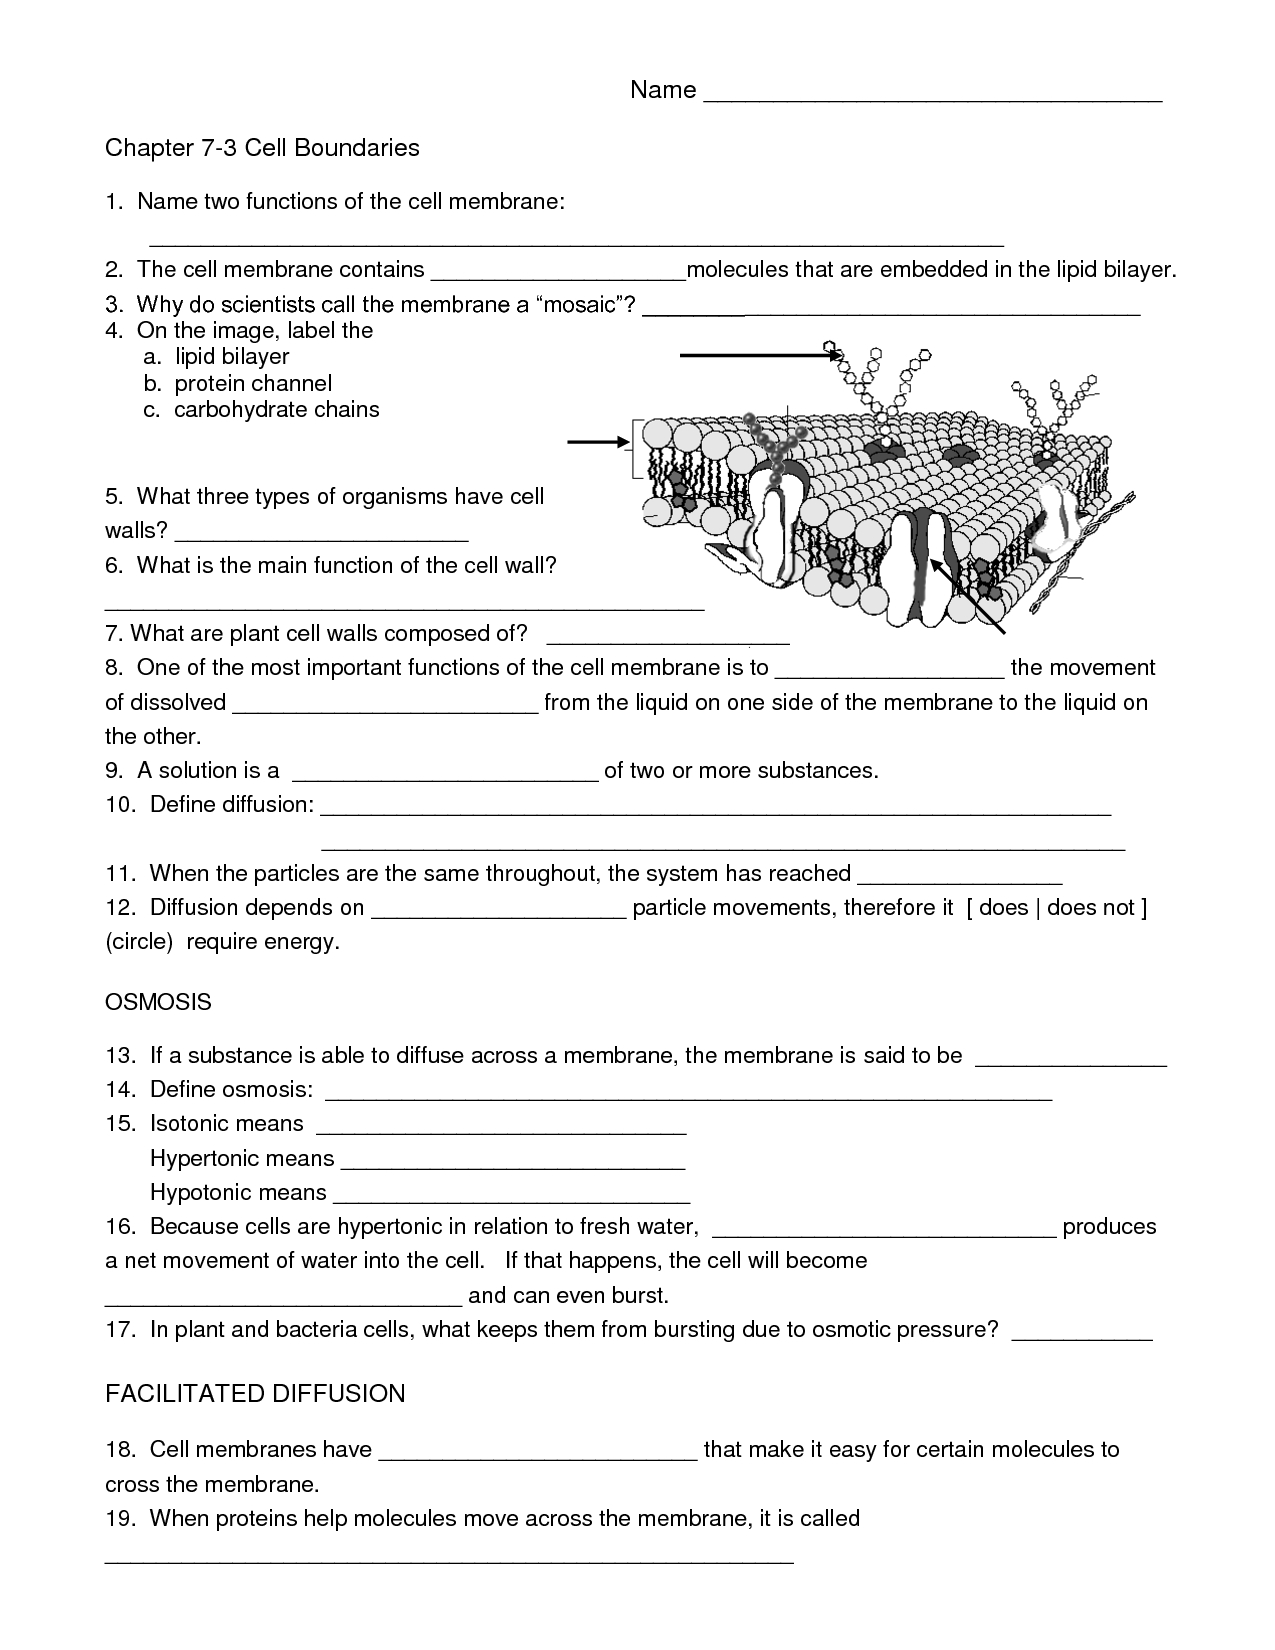 Biology Cell Worksheets | Carpe Diem Science | Pinterest - Free Printable Biology Worksheets For High School